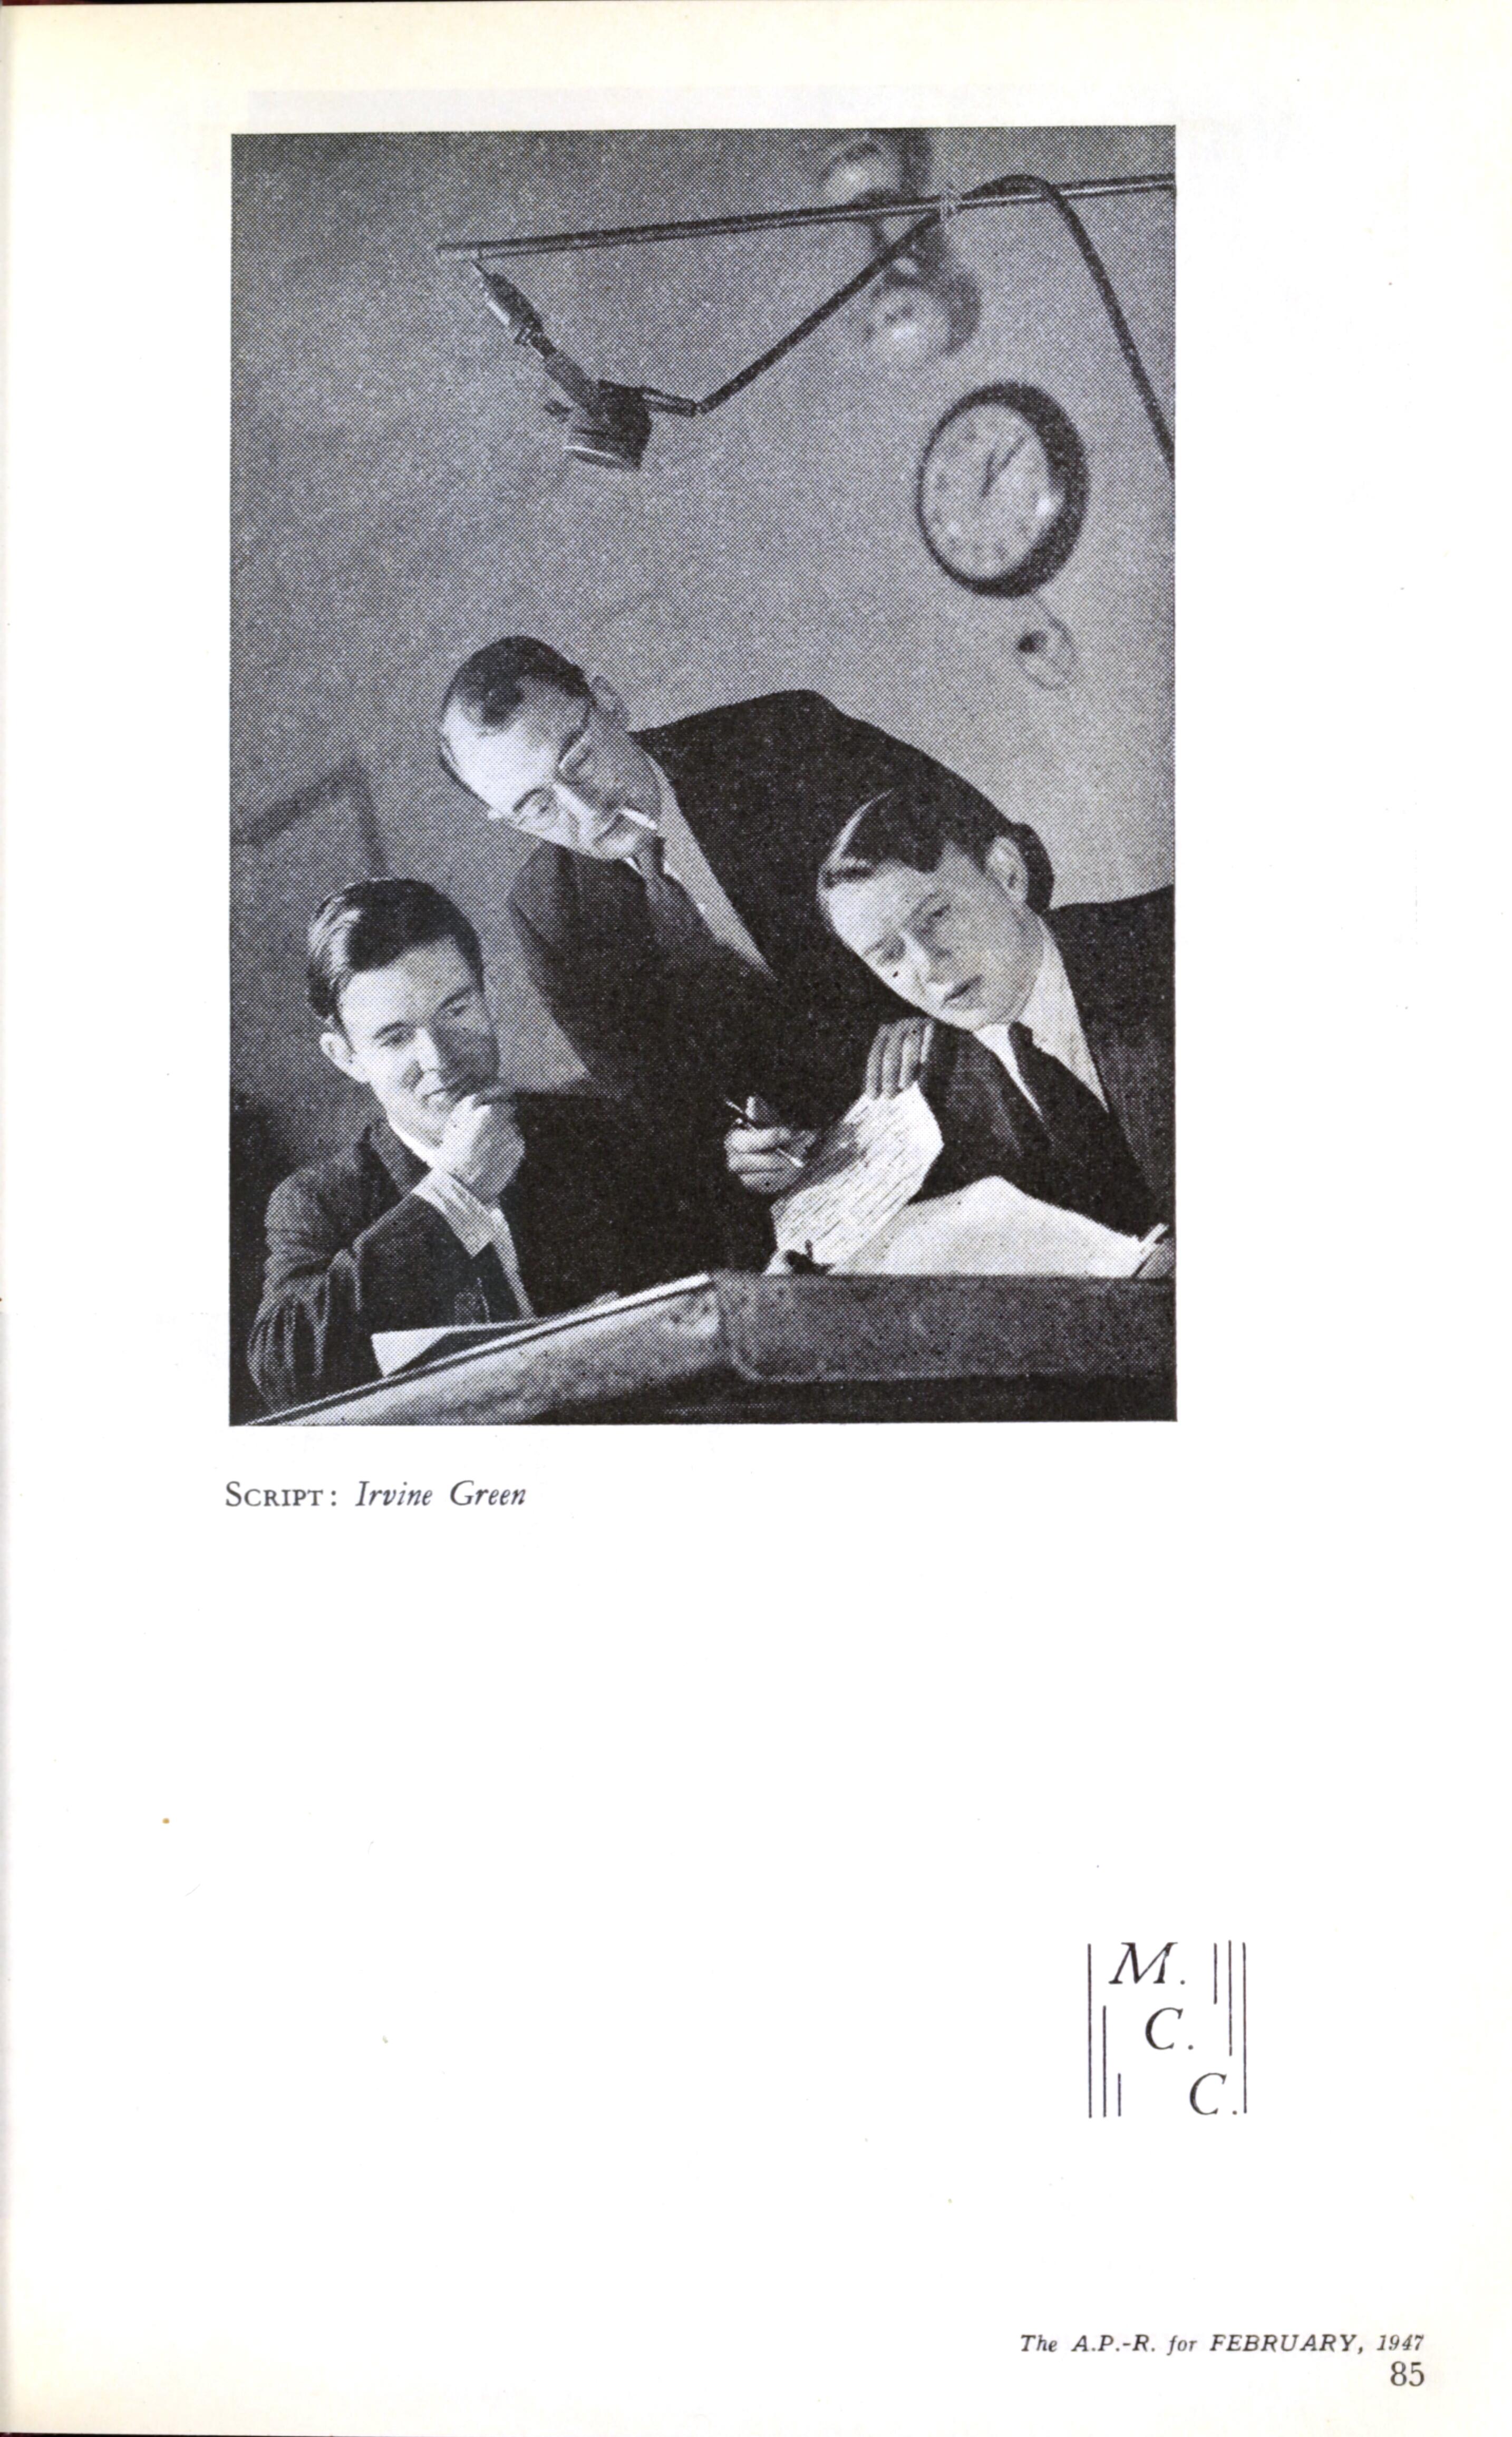 Australasian photo-review.Vol. 54 No. 2 1 February 1947-2